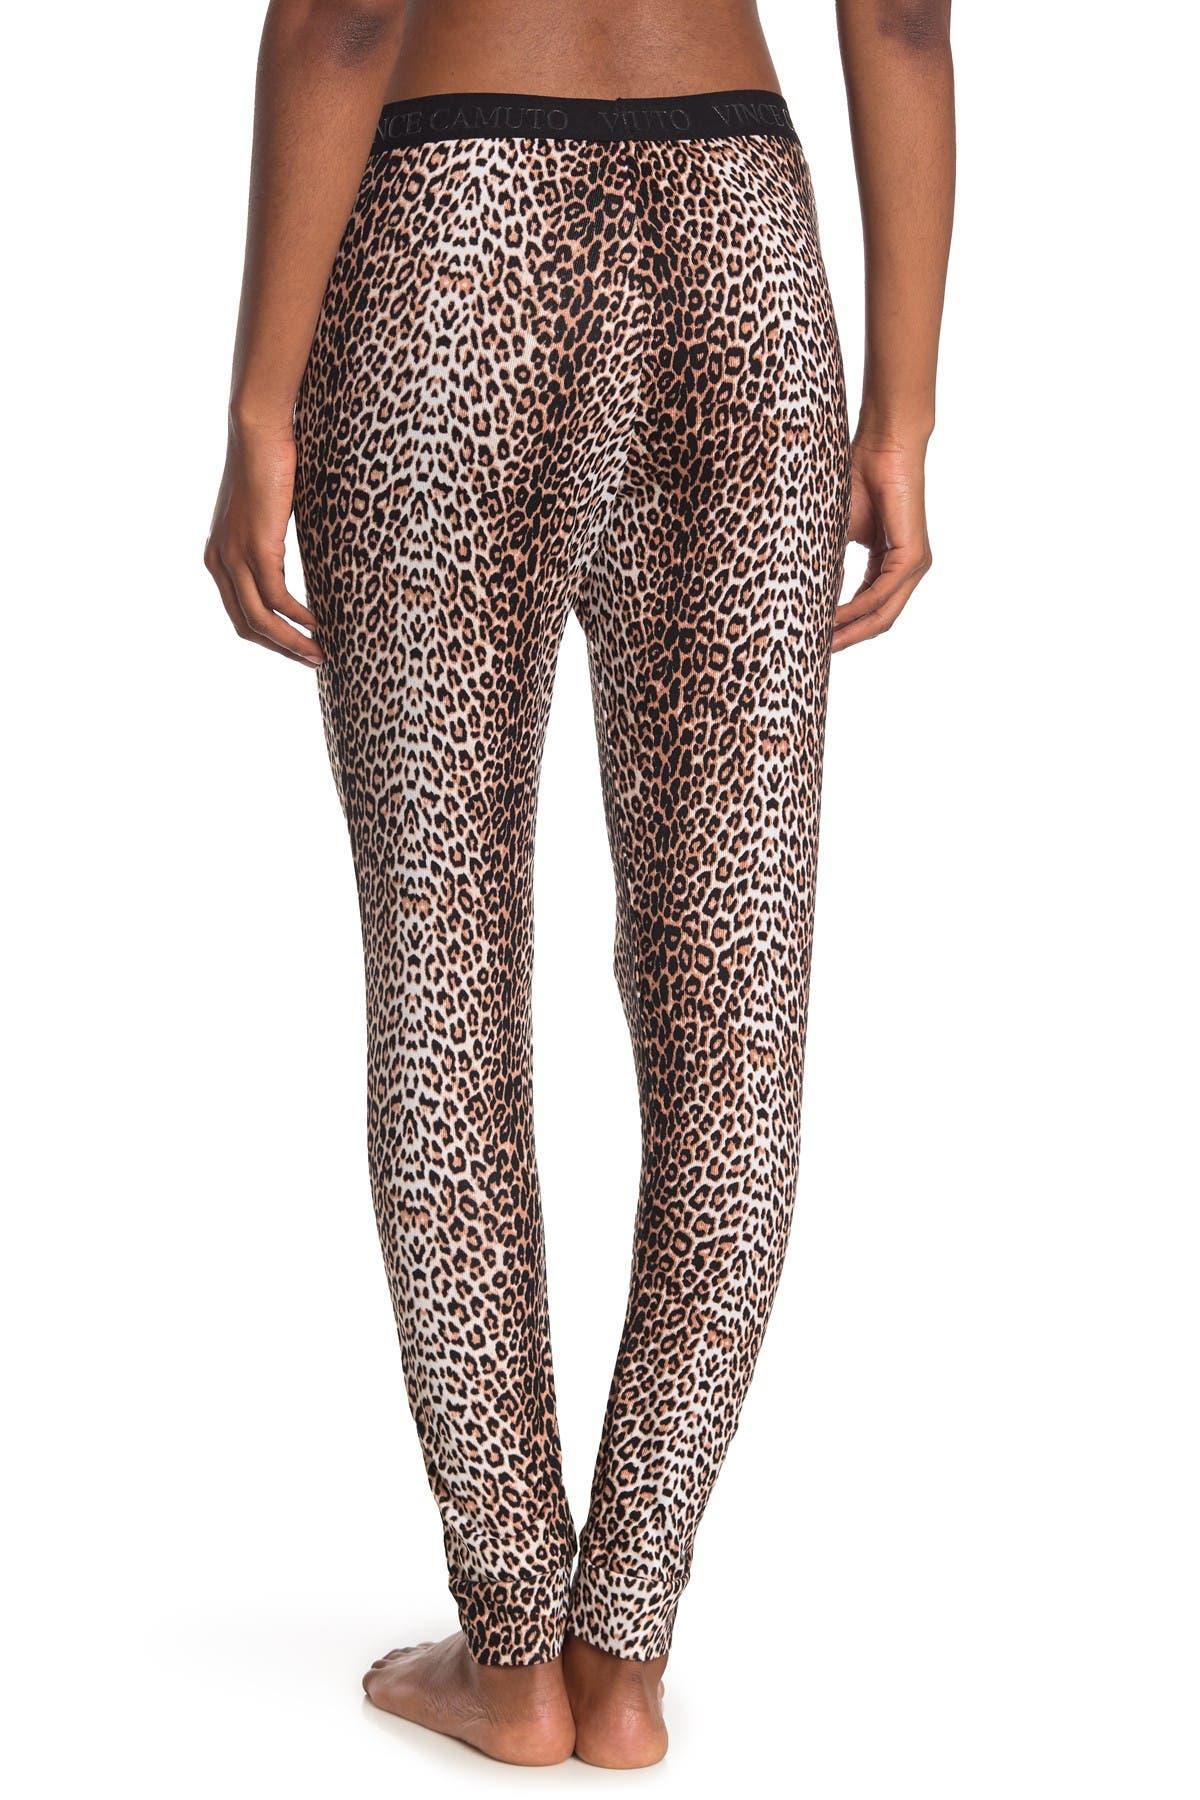 Vince Camuto Samantha Leopard Print Pajama Joggers